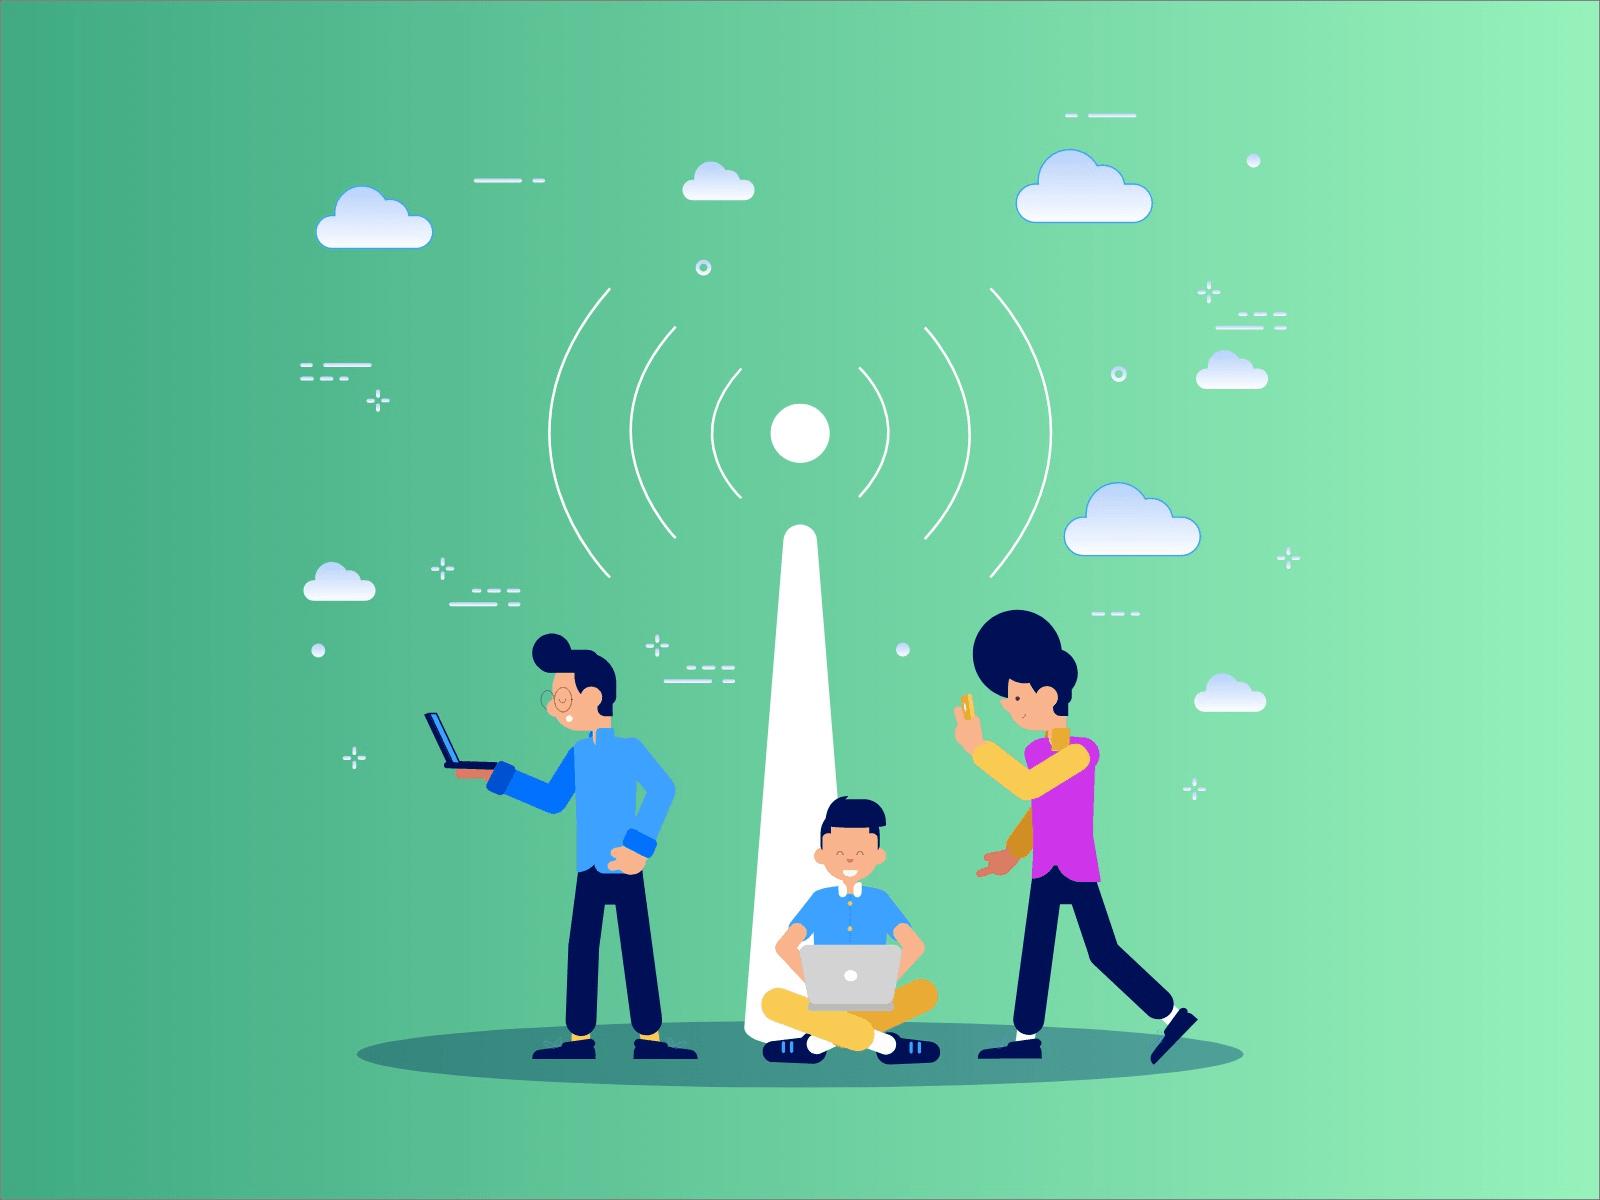 5+ Cara Mengetahui Password WiFi Yang Sedang Tersambung di Laptop atau Komputer